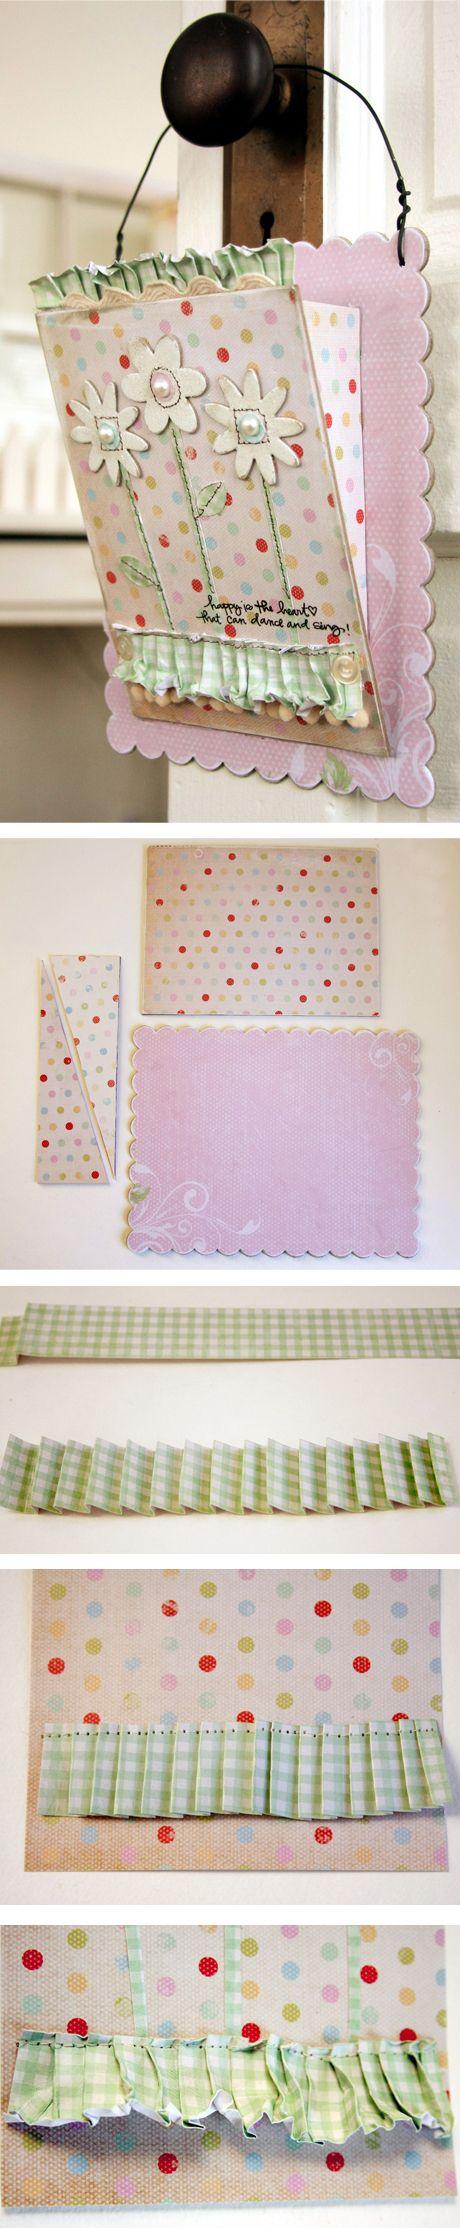 Mafy`s projectDiy Hanging, Ruffles Paper, Paper Ruffles, Ruffles Tutorials, Handmade Diy, Hanging Baskets